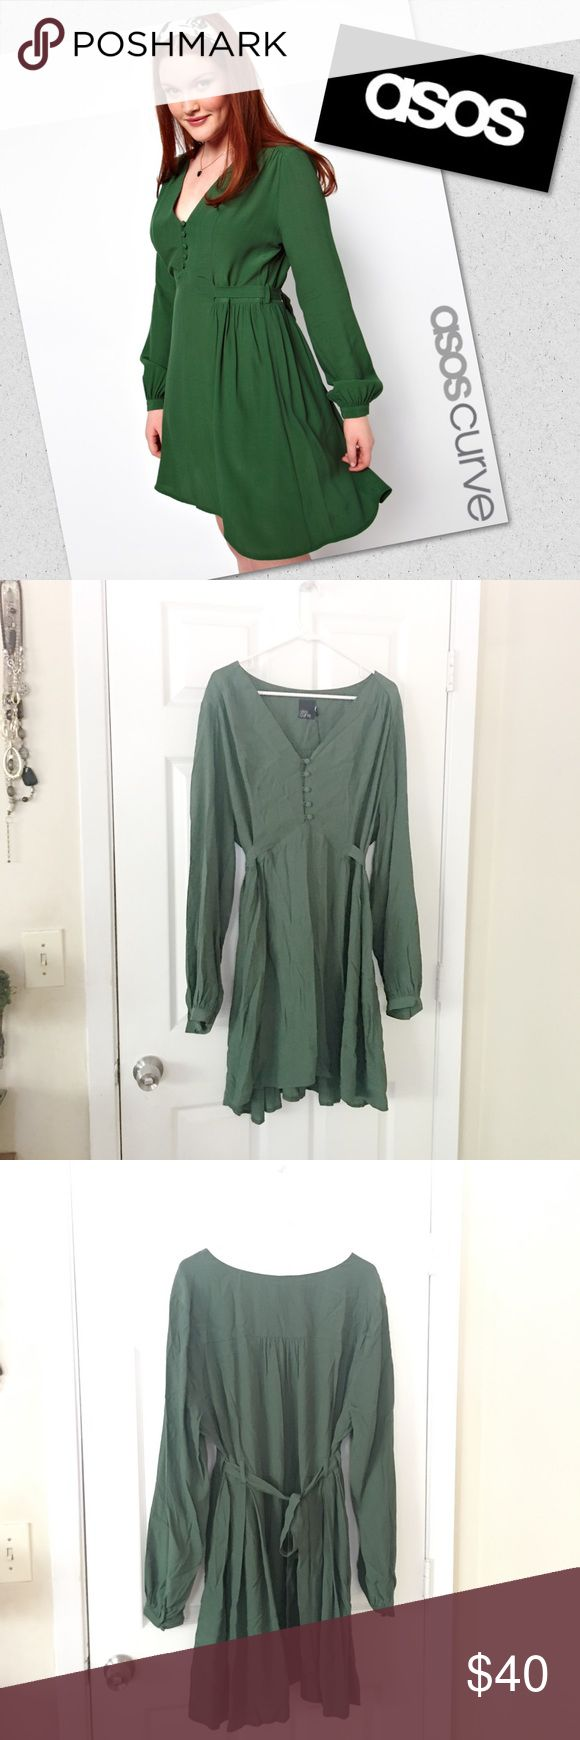 "•ASOS• Tea Dress Olive green dress. • Long sleeve • Button front • no modeling • no trades • 33"" shoulder to hem in front • 36"" shoulder to hem in back. • tie waist at the back of the dress. • THIS DRESS IS OLIVE GREEN. ASOS Curve Dresses Long Sleeve"